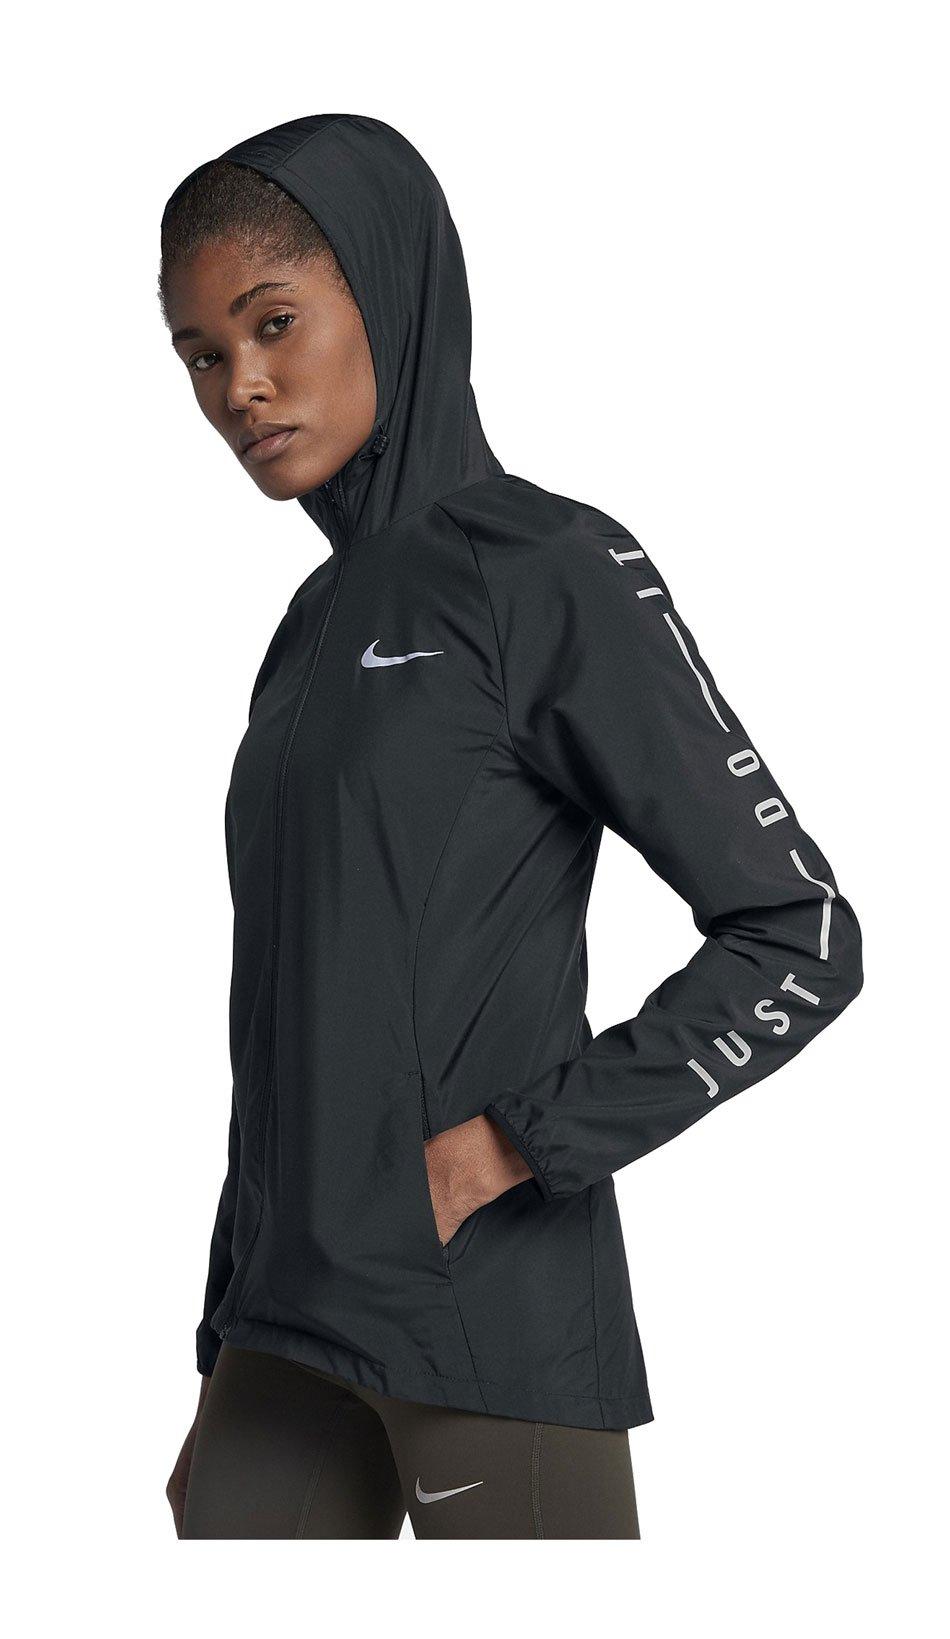 516b3812 Куртка Nike Essential Jacket W | Интернет-магазин Runlab